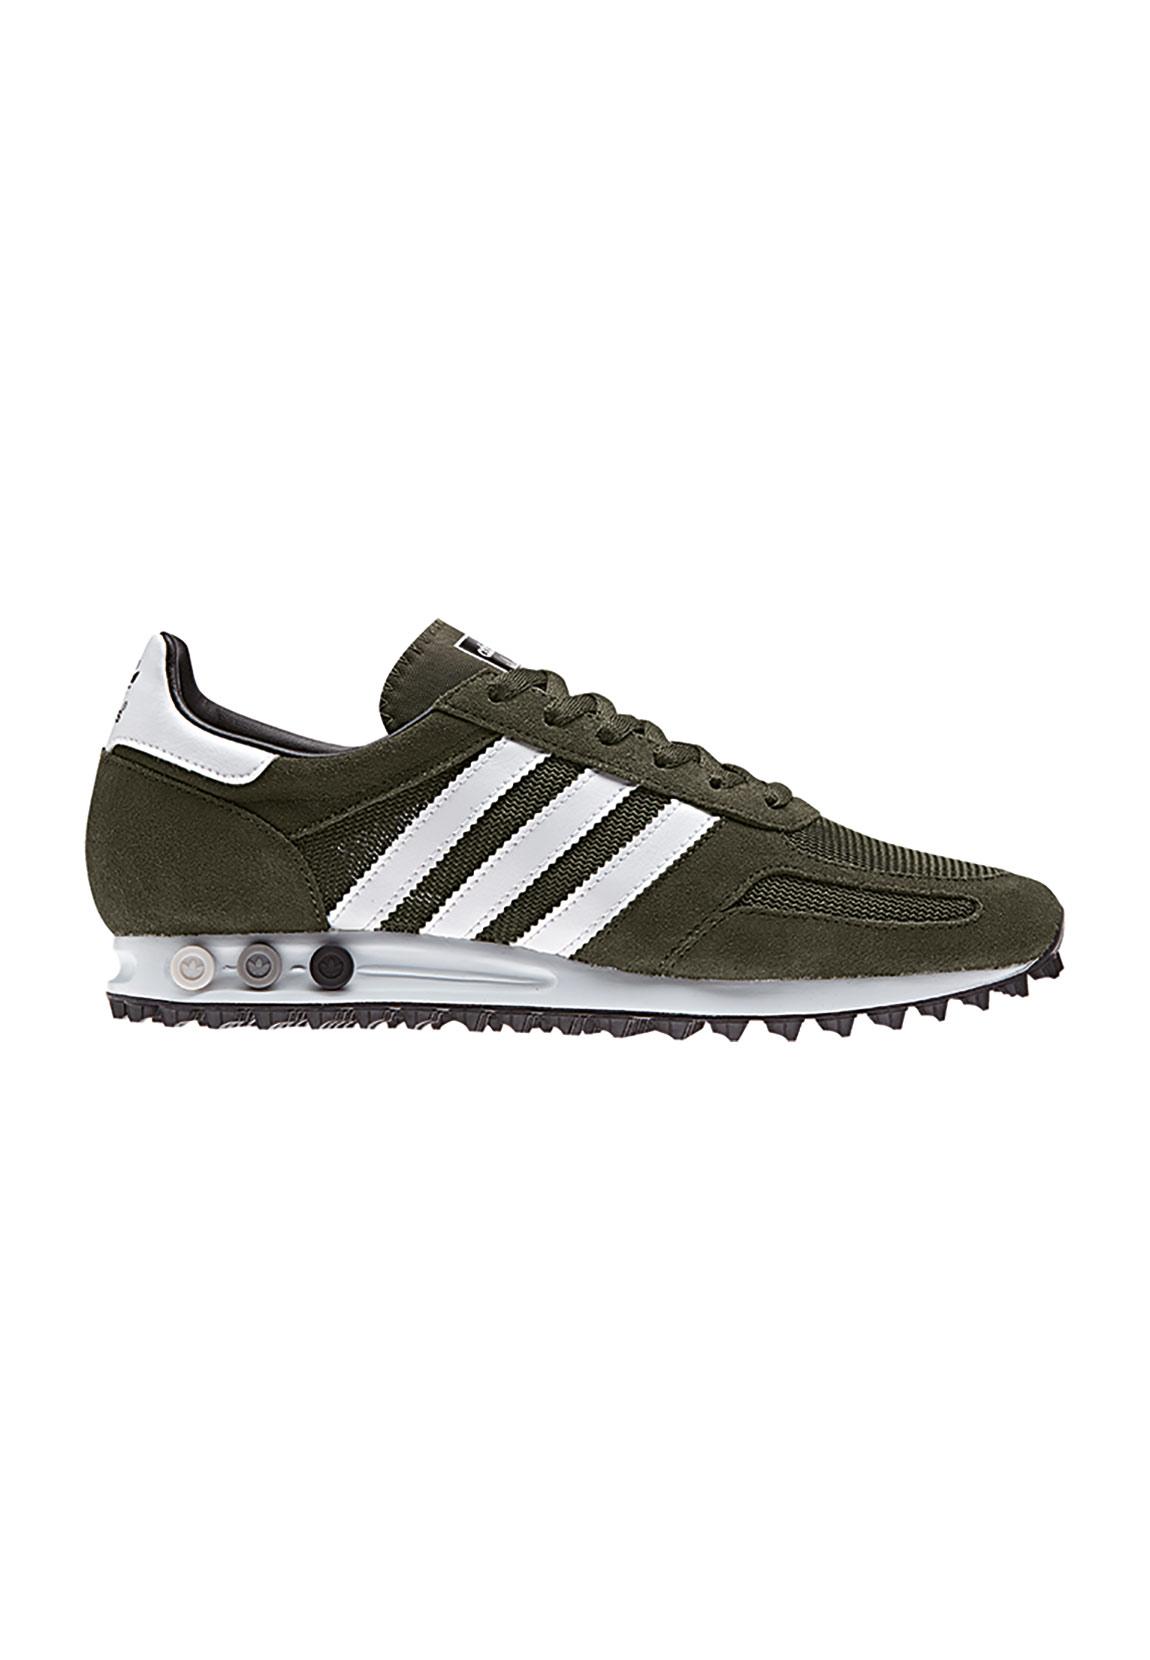 57532a2b13b8be Adidas Sneaker Herren LA TRAINER OG BY9328 Grün